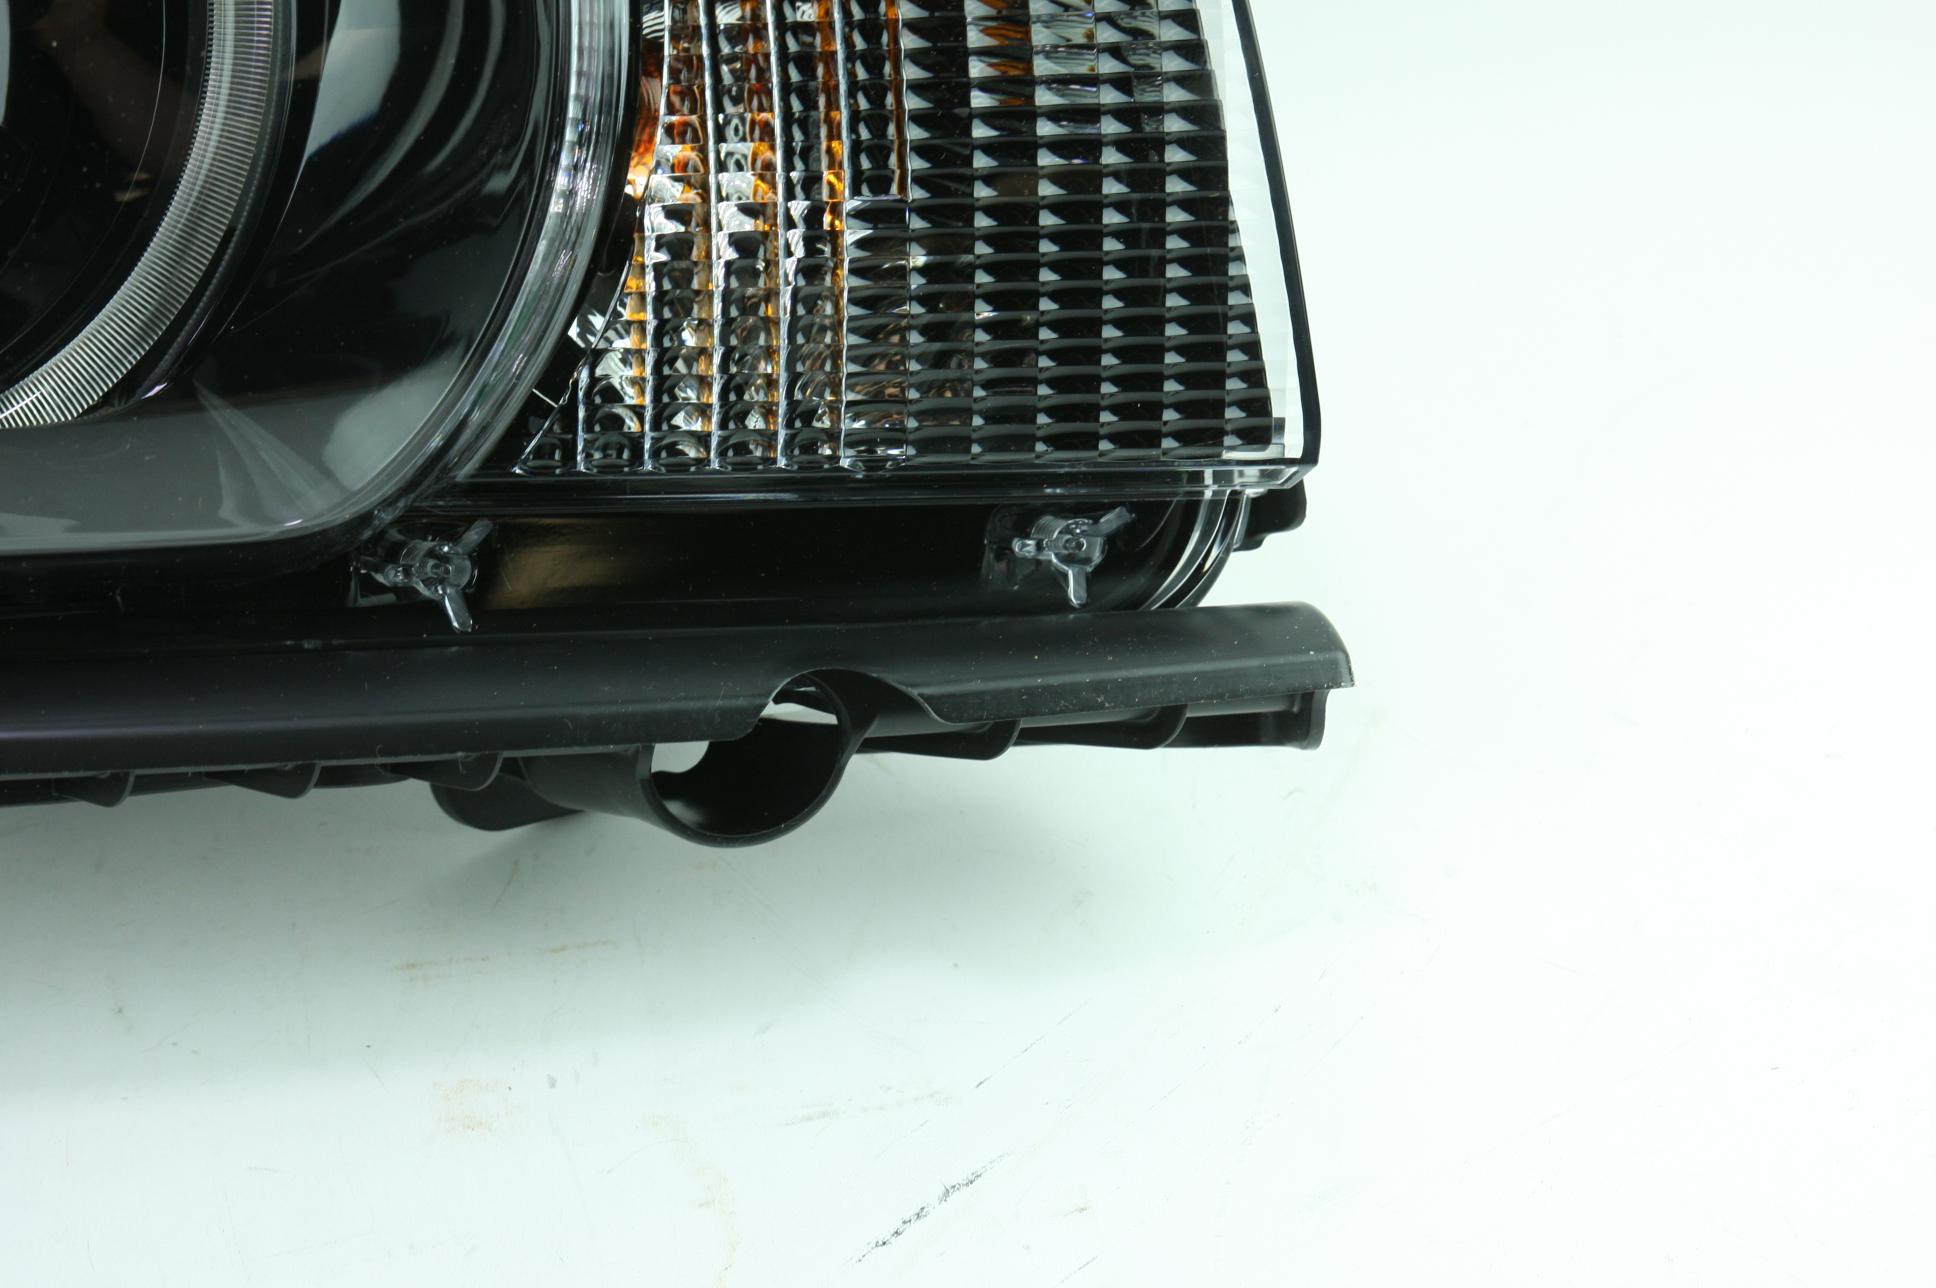 New Genuine OEM GM 22959920 Right Headlight Assembly 10-15 Chevy Camaro NIP - image 4